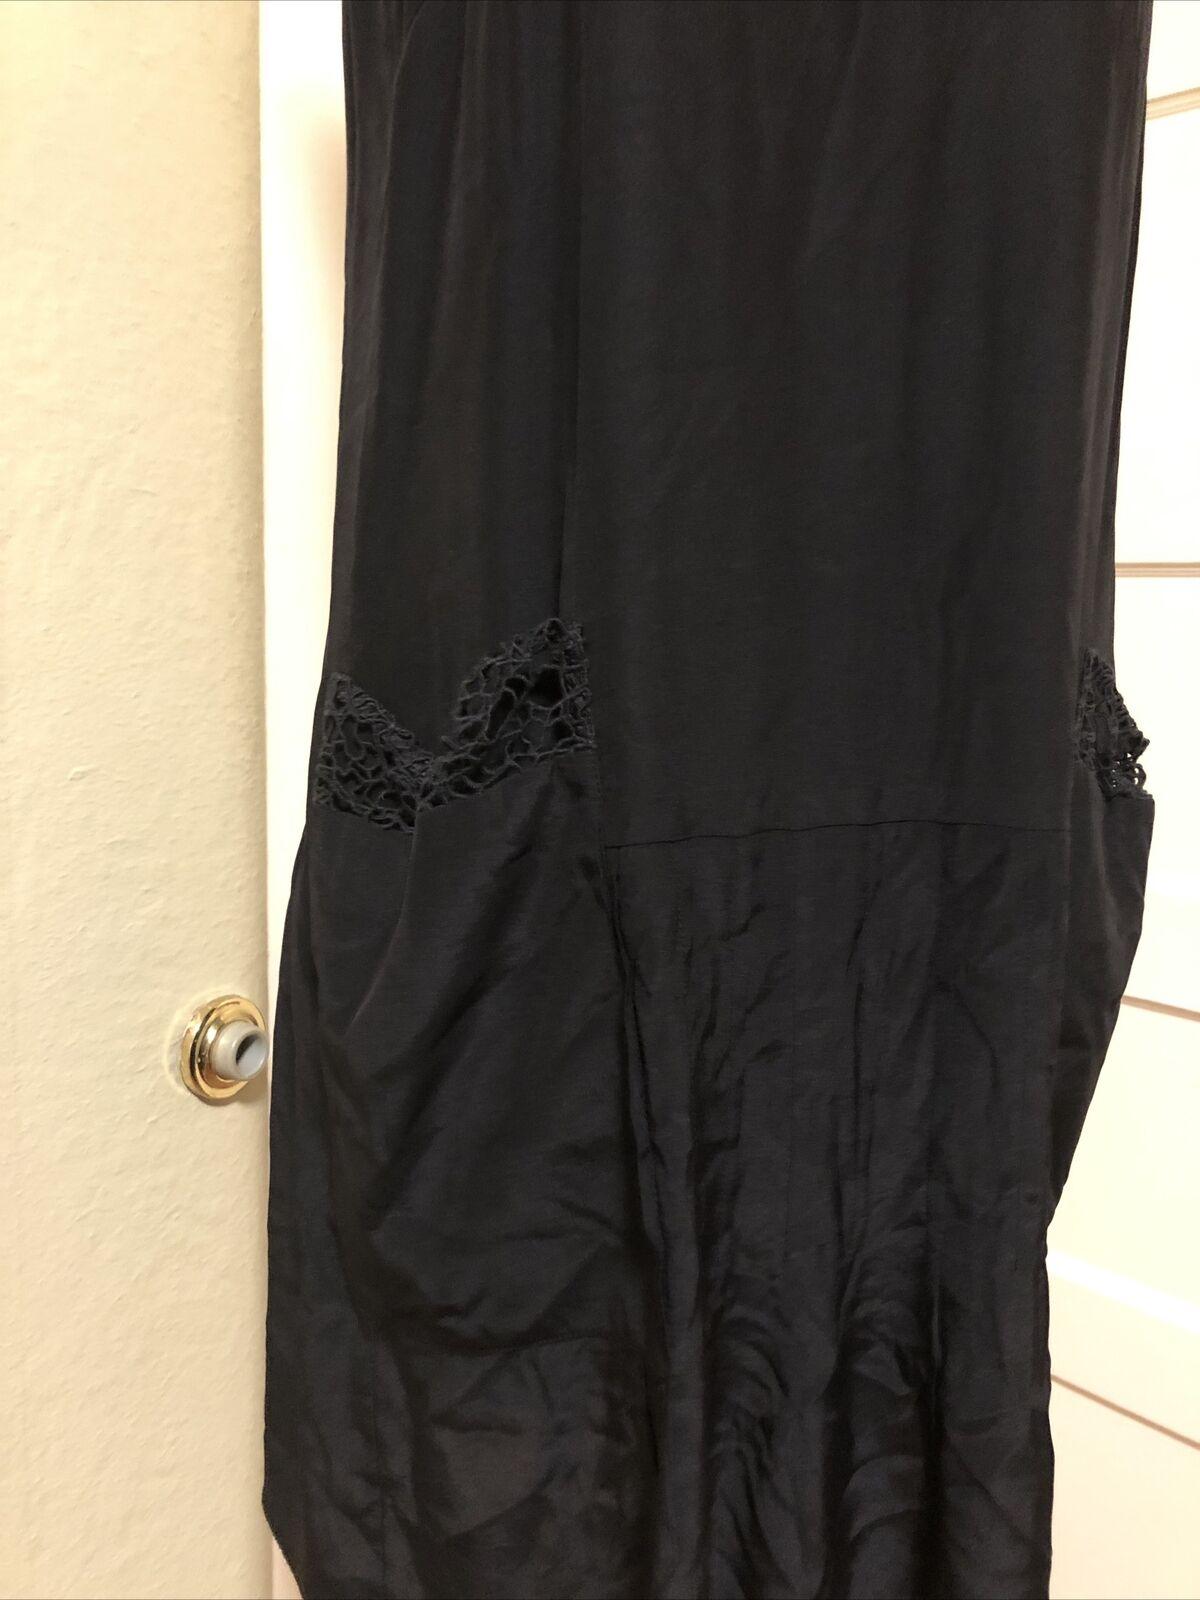 Rag And Bone Black Silk Dress Pockets 6 Mesh Neck… - image 2